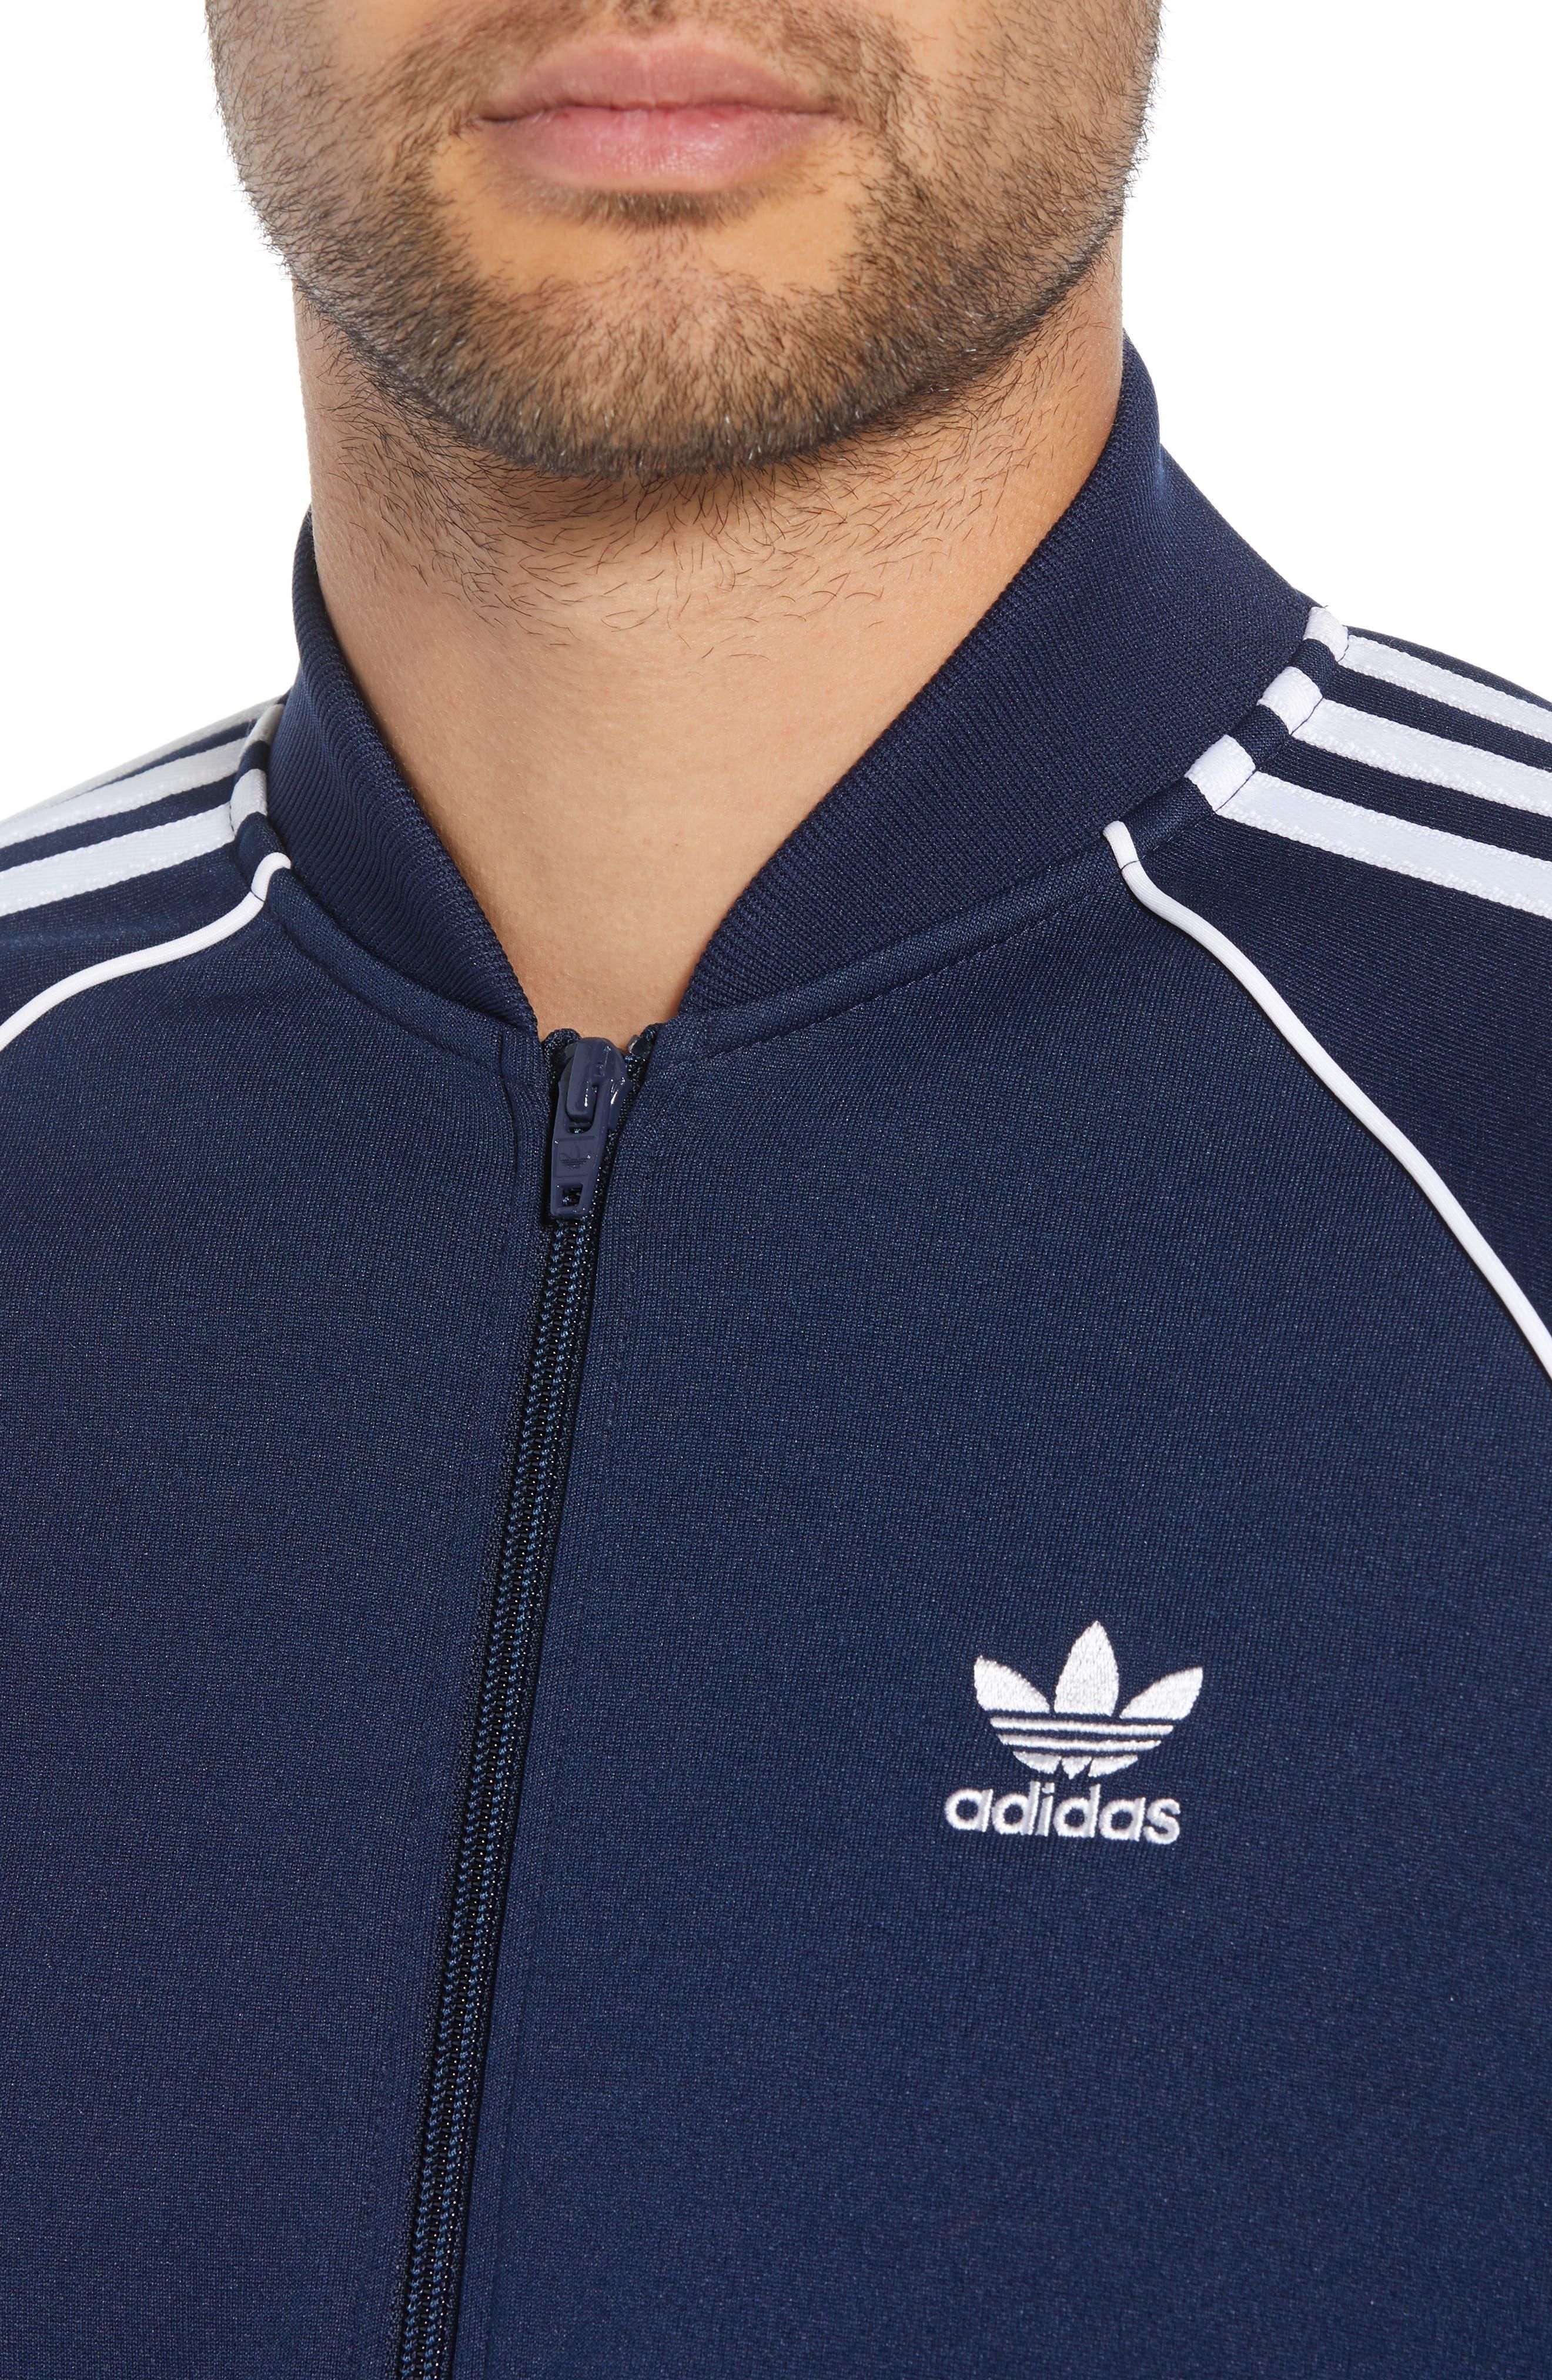 adidas SST Track Jacket,                             Alternate thumbnail 4, color,                             COLLEGIATE NAVY